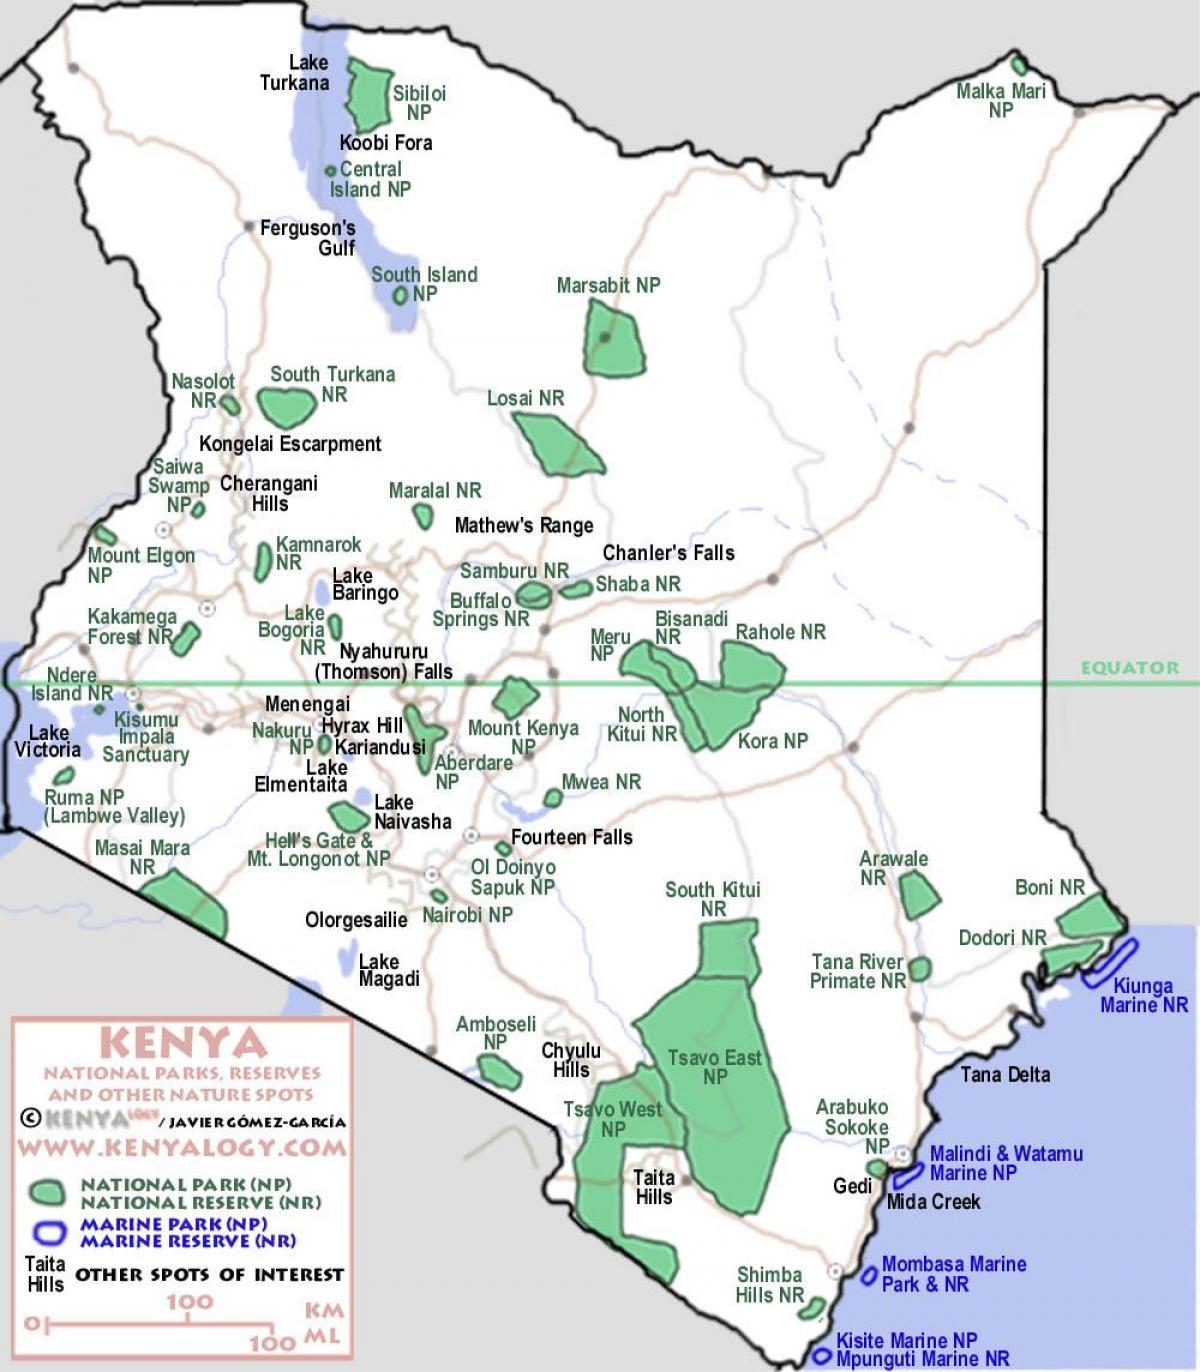 kart over kenya Kenya safari kart   Kart over Kenya safari (Øst Afrika   Afrika) kart over kenya